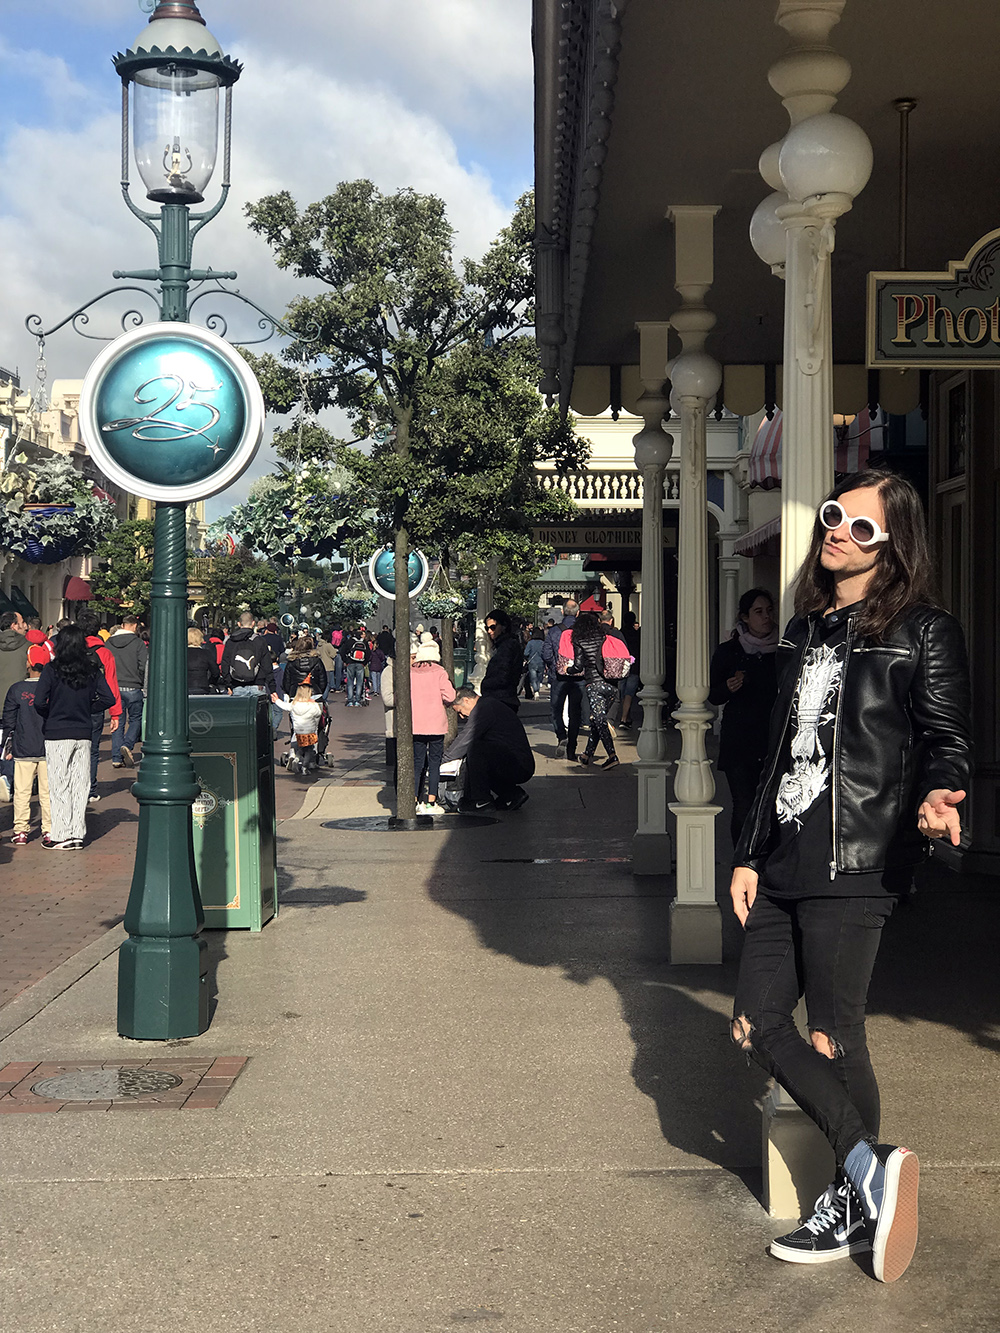 Toda a magia da Disneylândia Paris